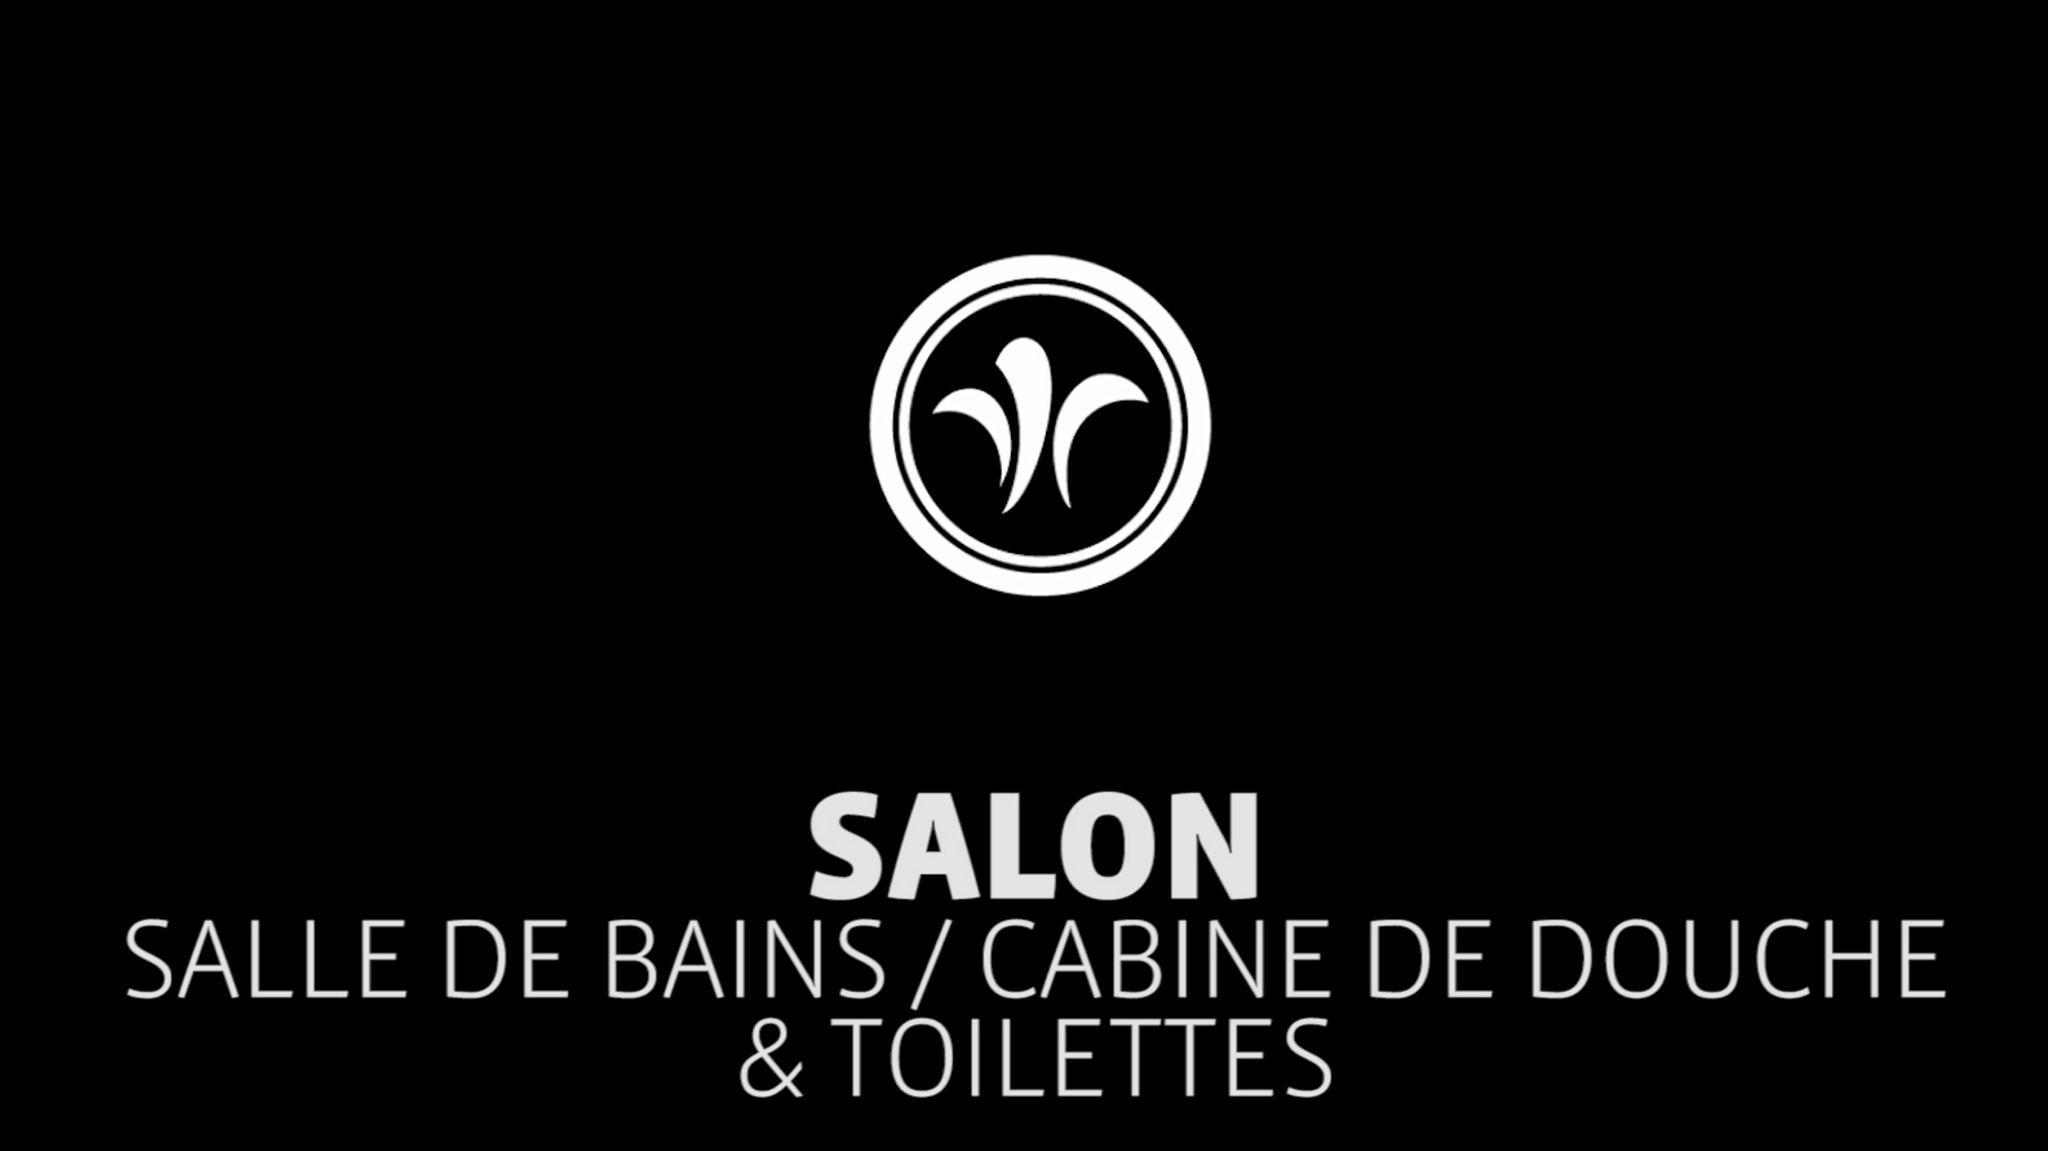 cabine de douche dans la salle de bain // Niesmann+Bischoff - Camping-car (ARTO) // 2019 // WO4